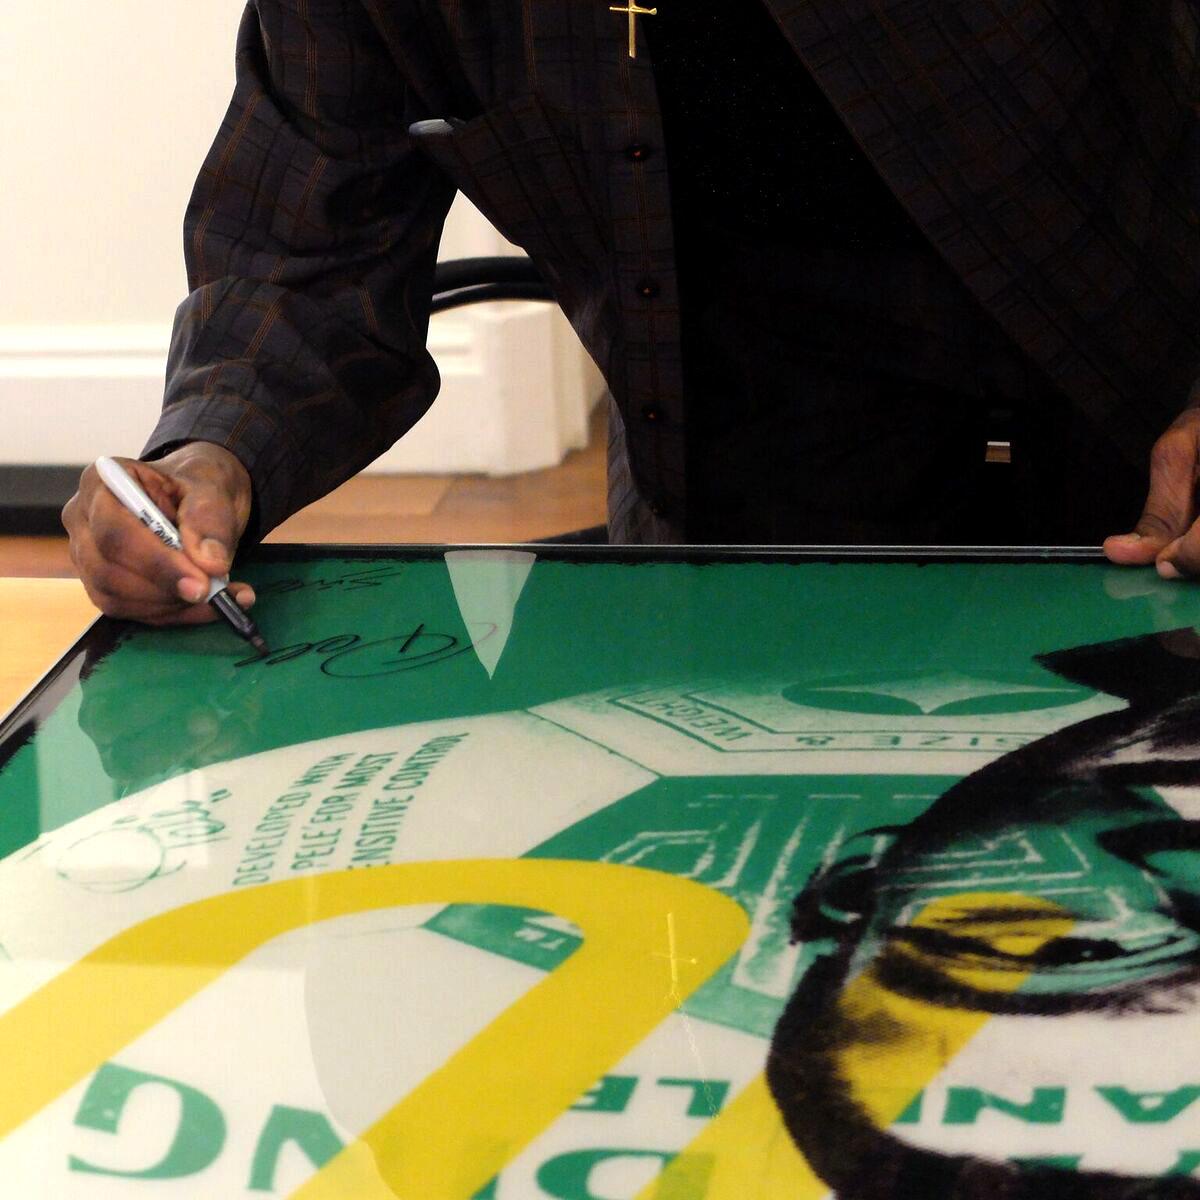 Louis Sidoli Neon Art: Pele Art Life Football - Halyon Gallery - 3